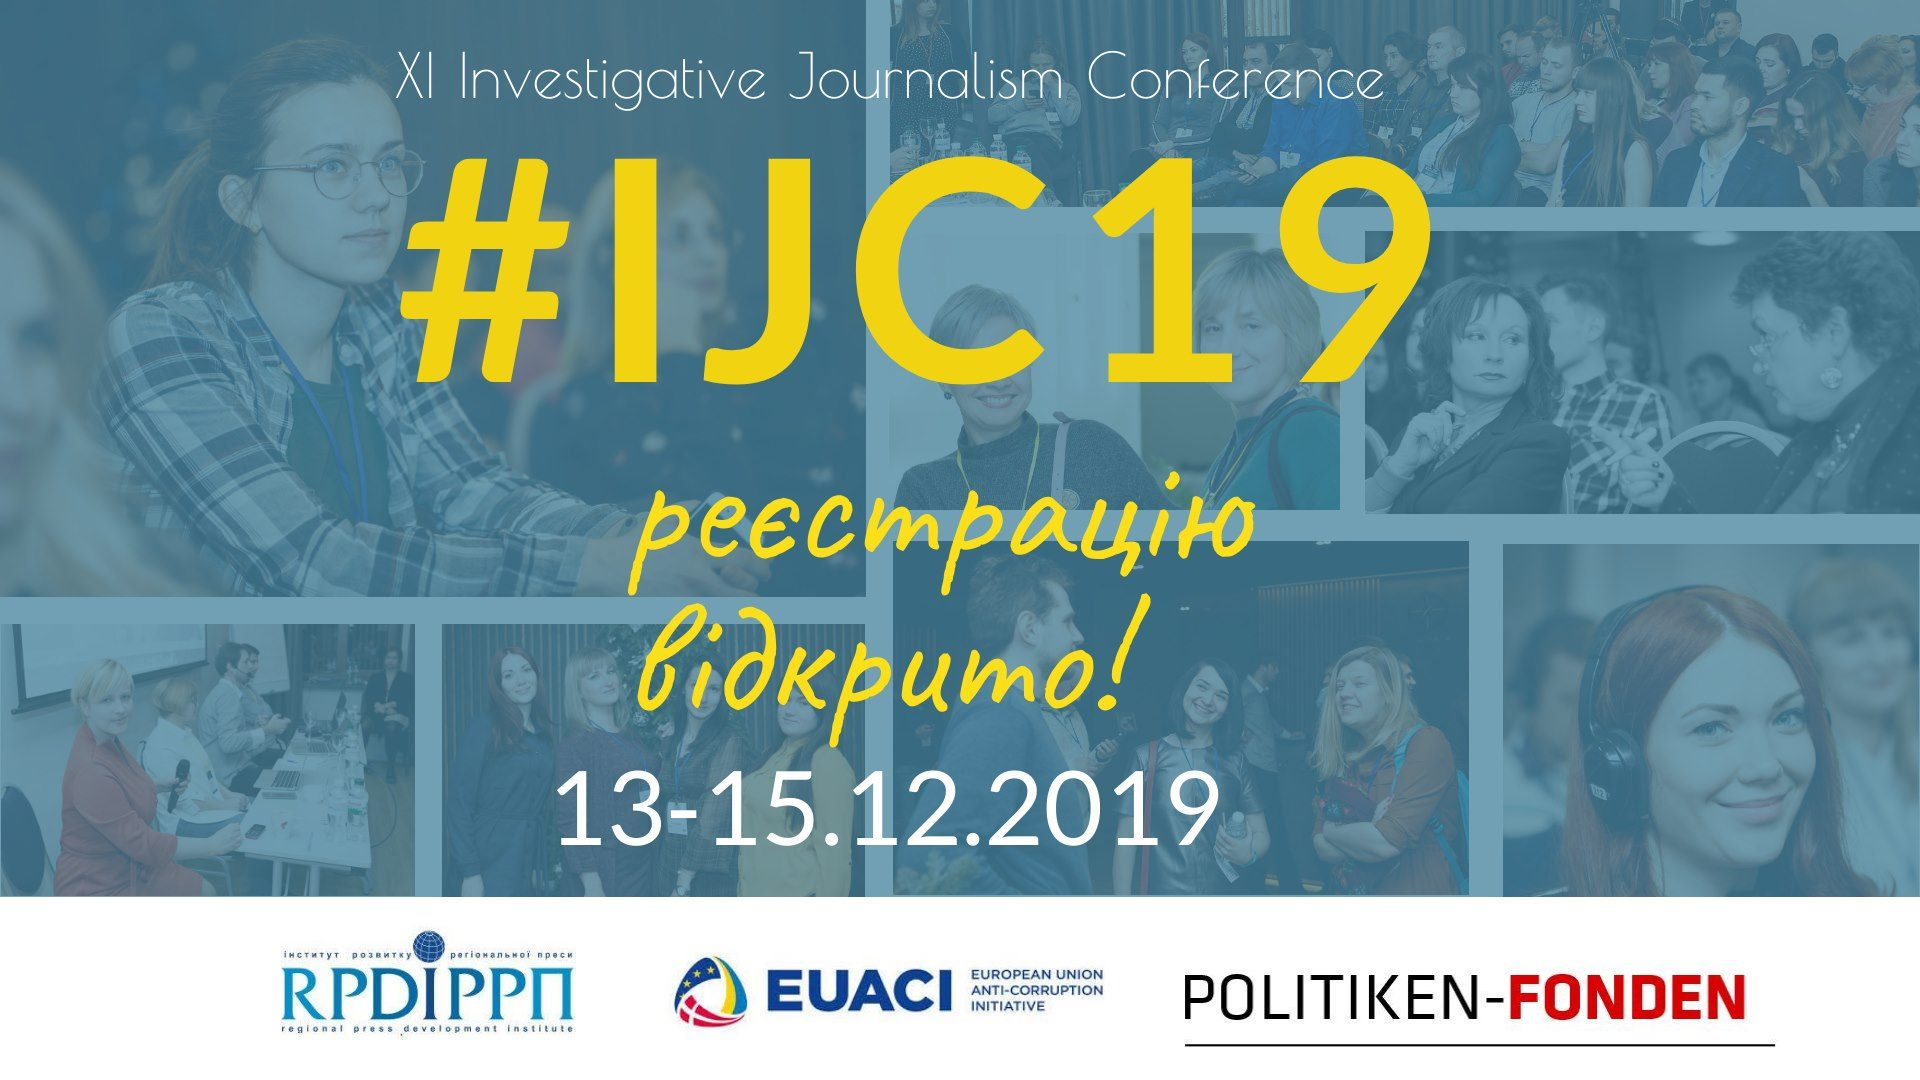 IJC19 – Investigative journalism conference